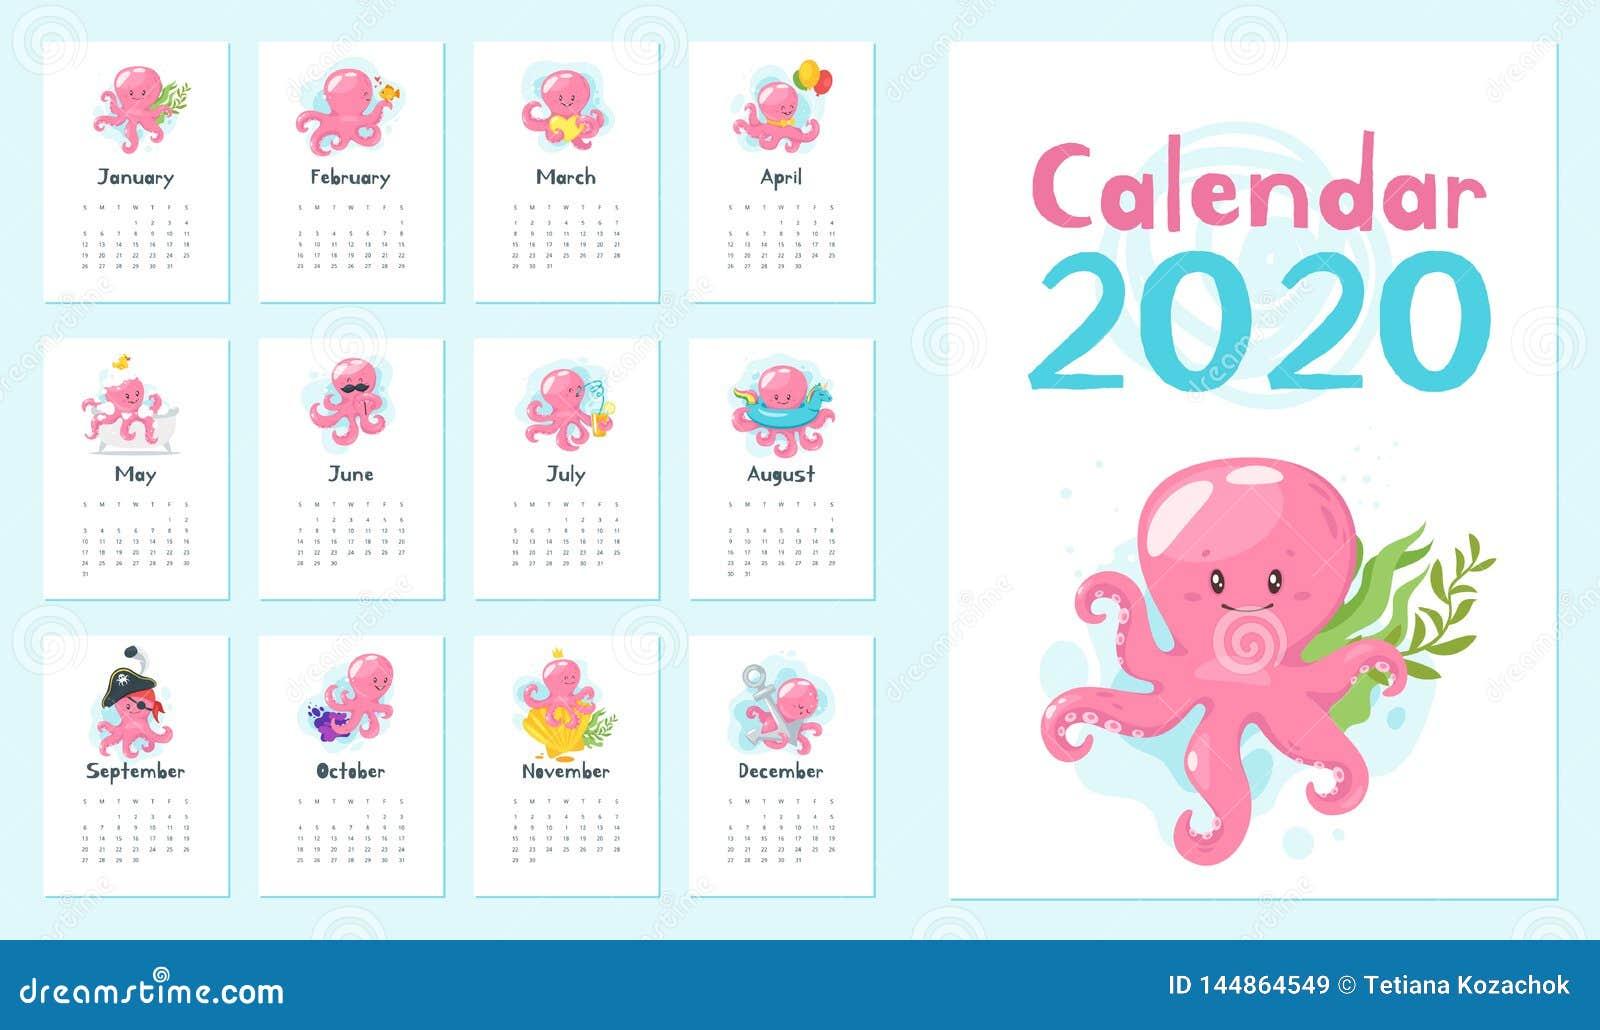 2020 calendar page.